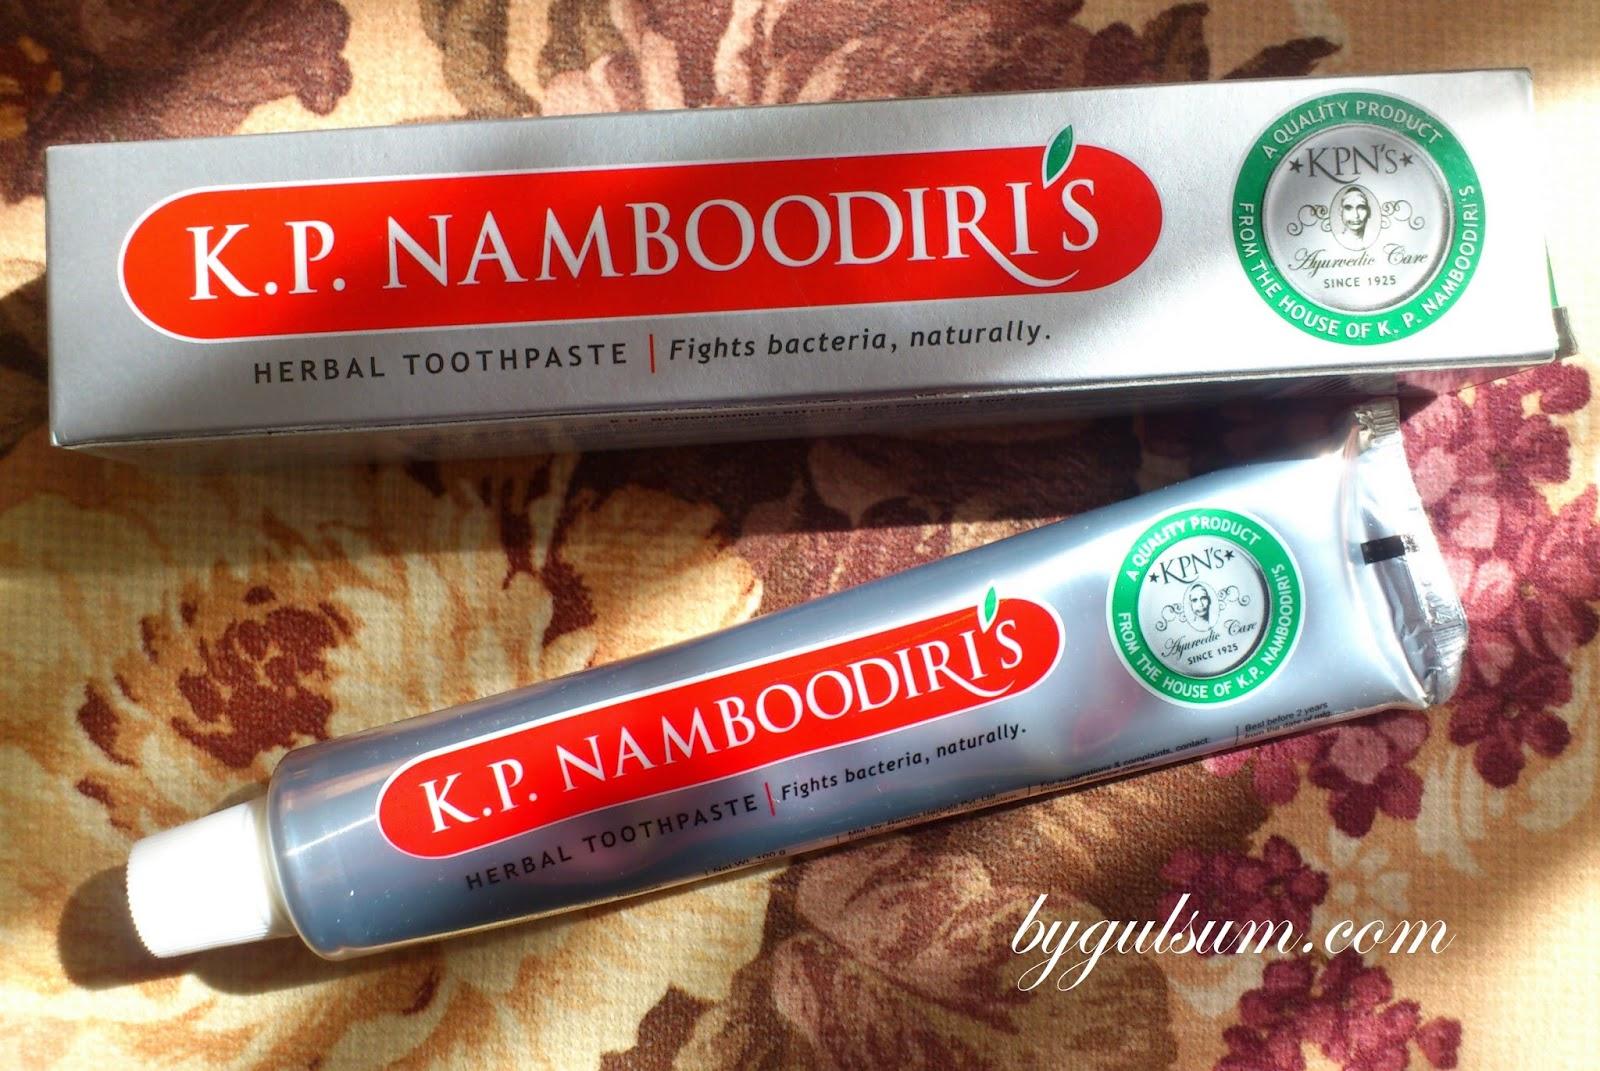 KP Namboodiri's Herbal Toothpaste